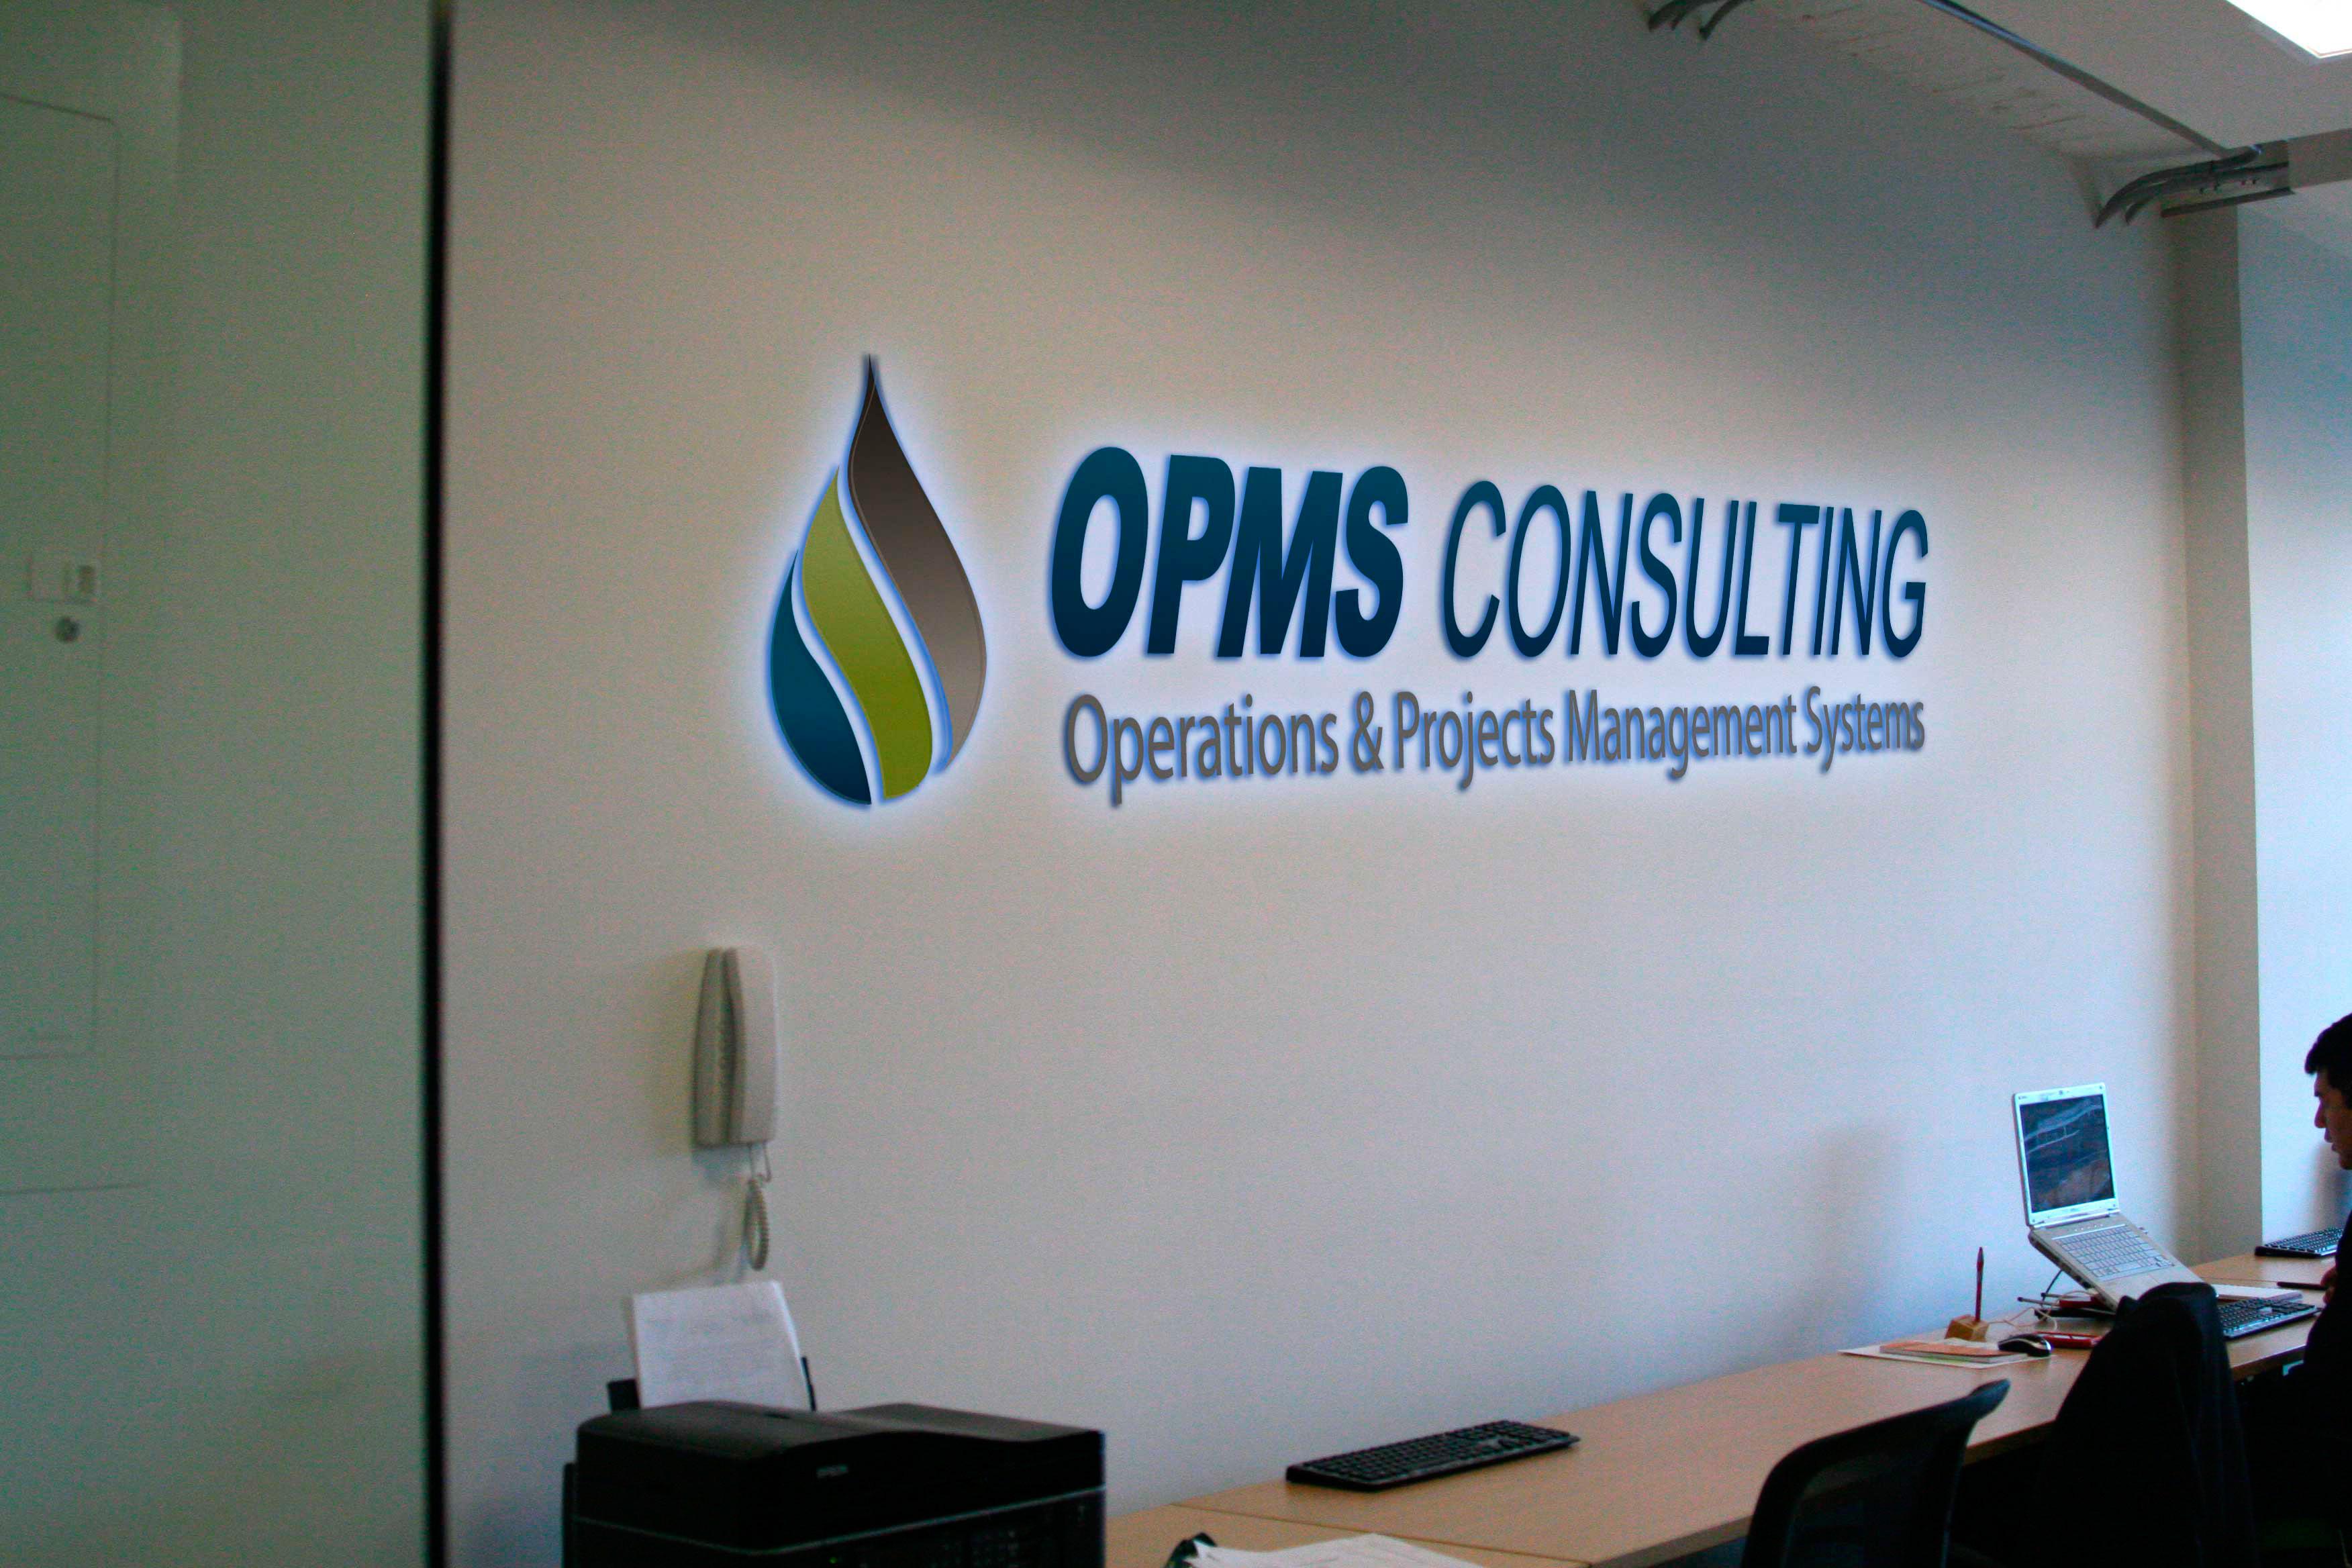 OPMS-aviso-pared--045